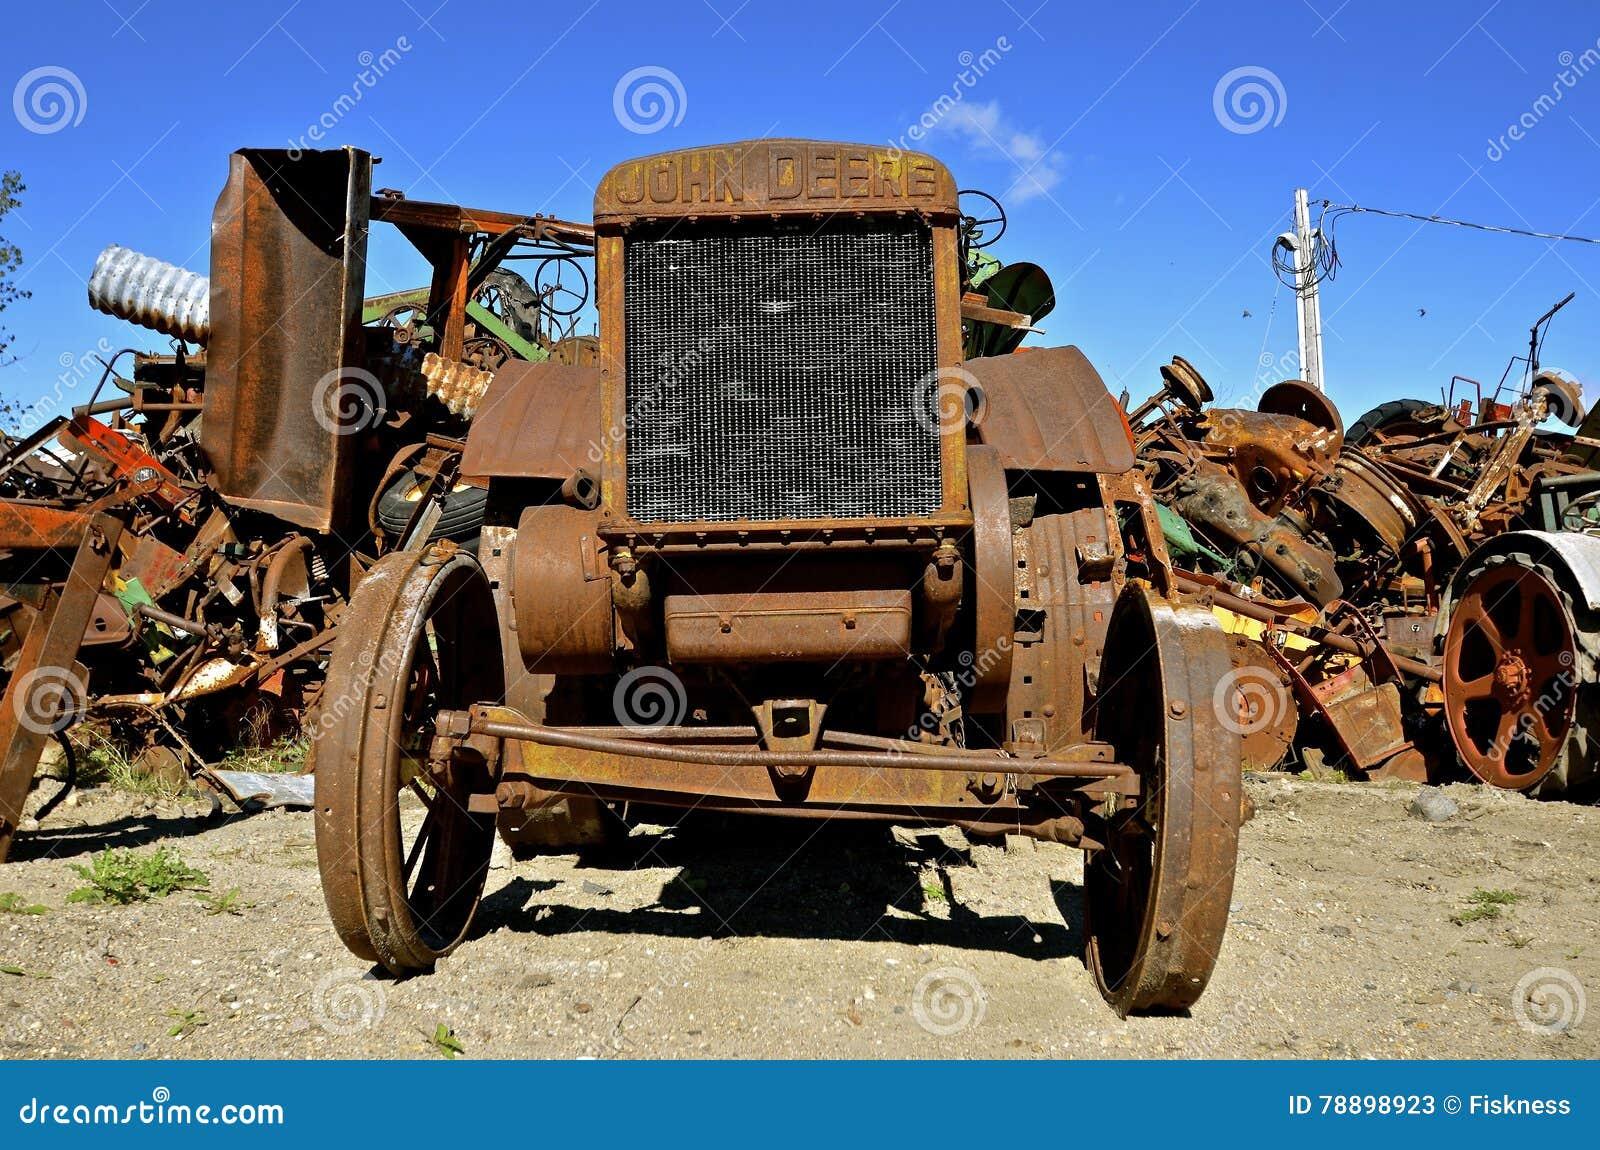 Rusty john deere tractor by scrap iron pile editorial for Scrap tractor tires